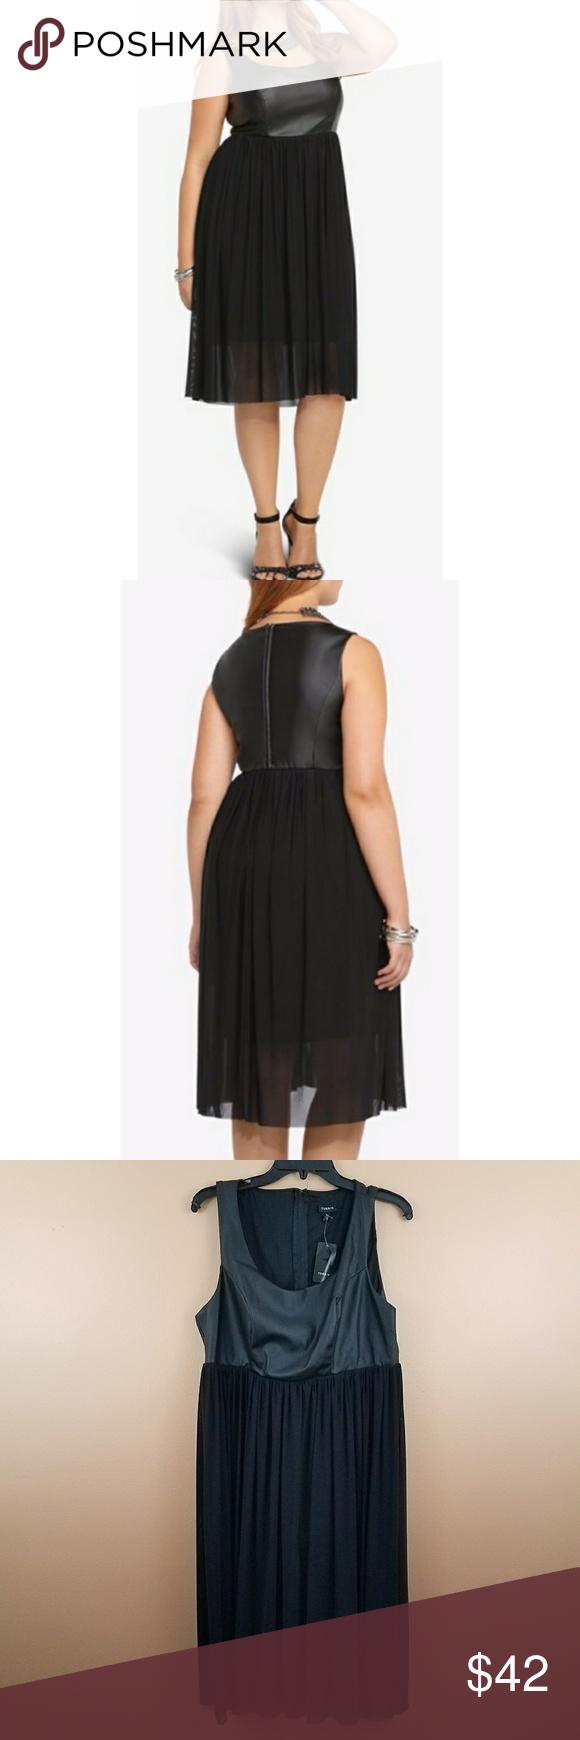 Torrid Faux Leather Ponte Mesh Dress Mesh Dress Torrid Dresses Clothes Design [ 1740 x 580 Pixel ]